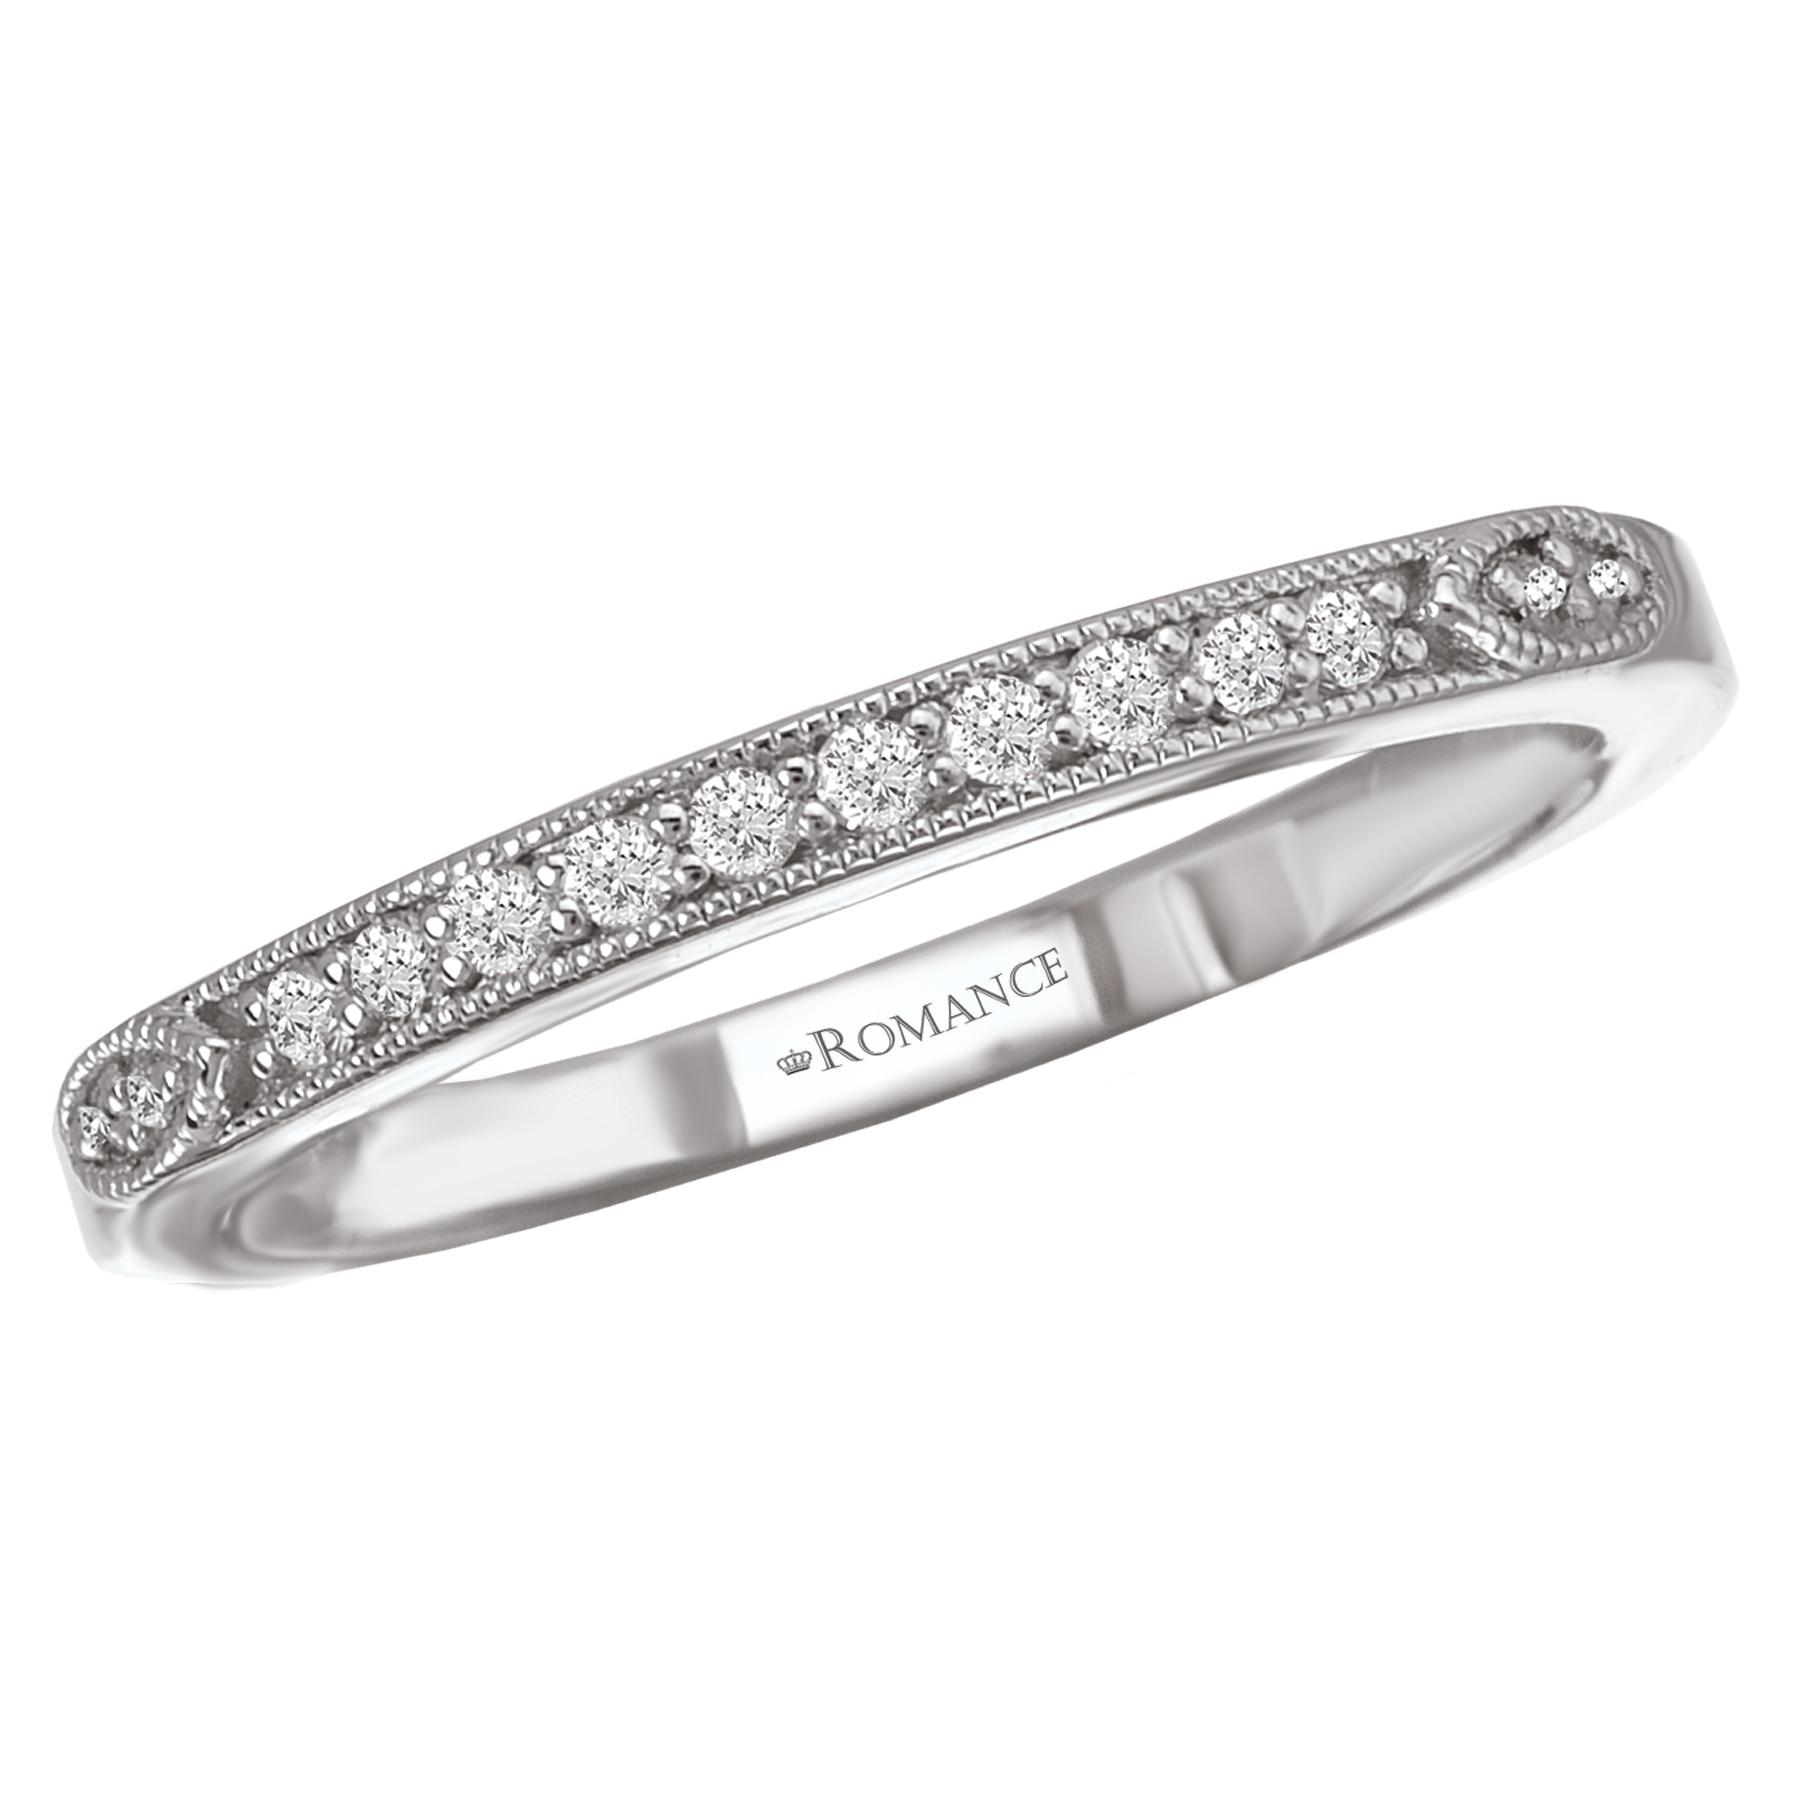 Romance Wedding Bands 117480-W product image